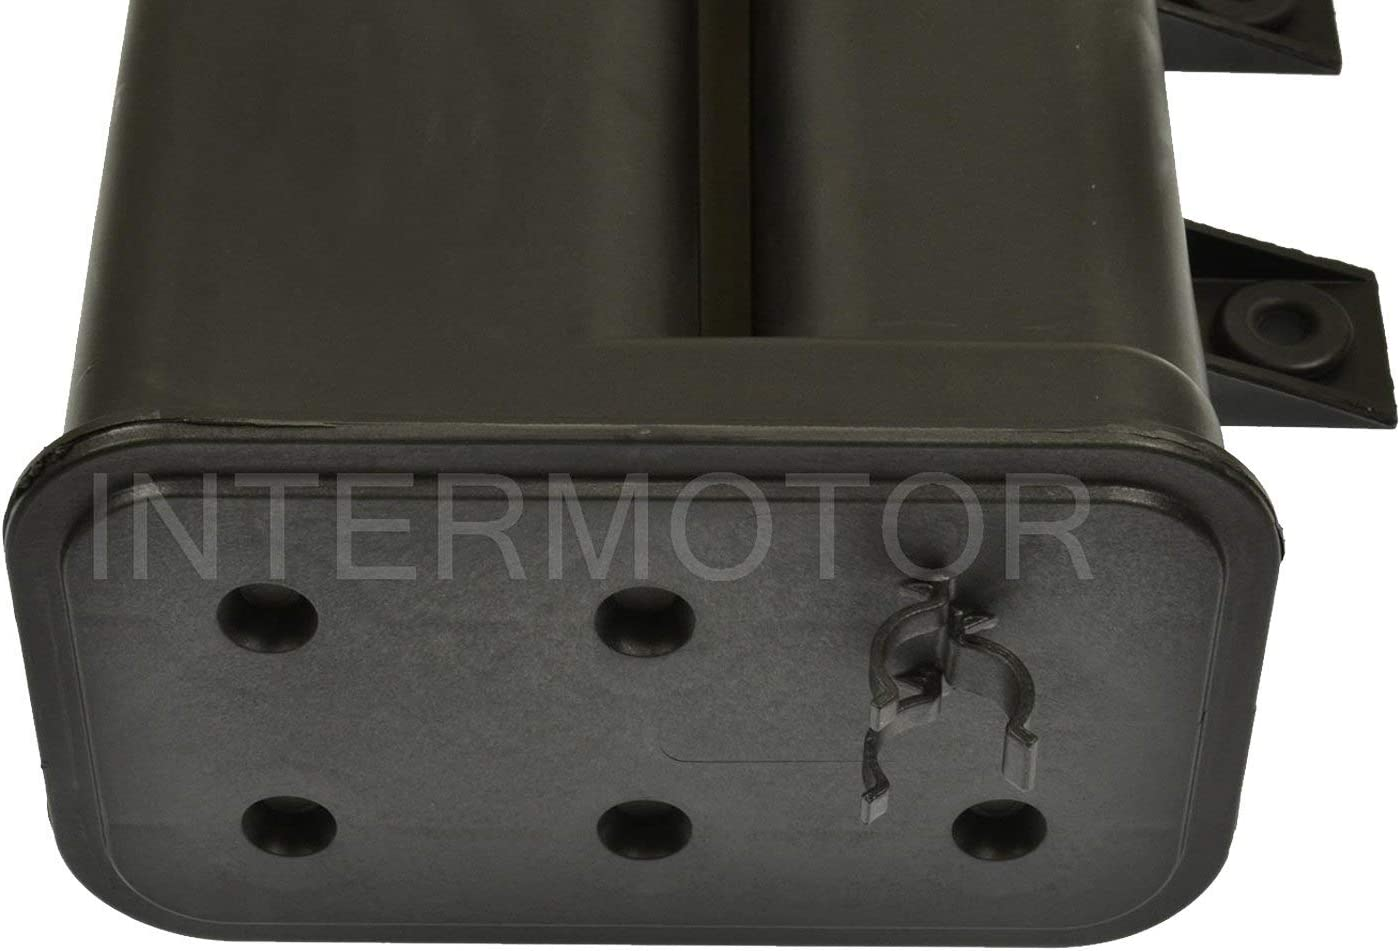 Standard CP3571 Intermotor Fuel Vapor Canister